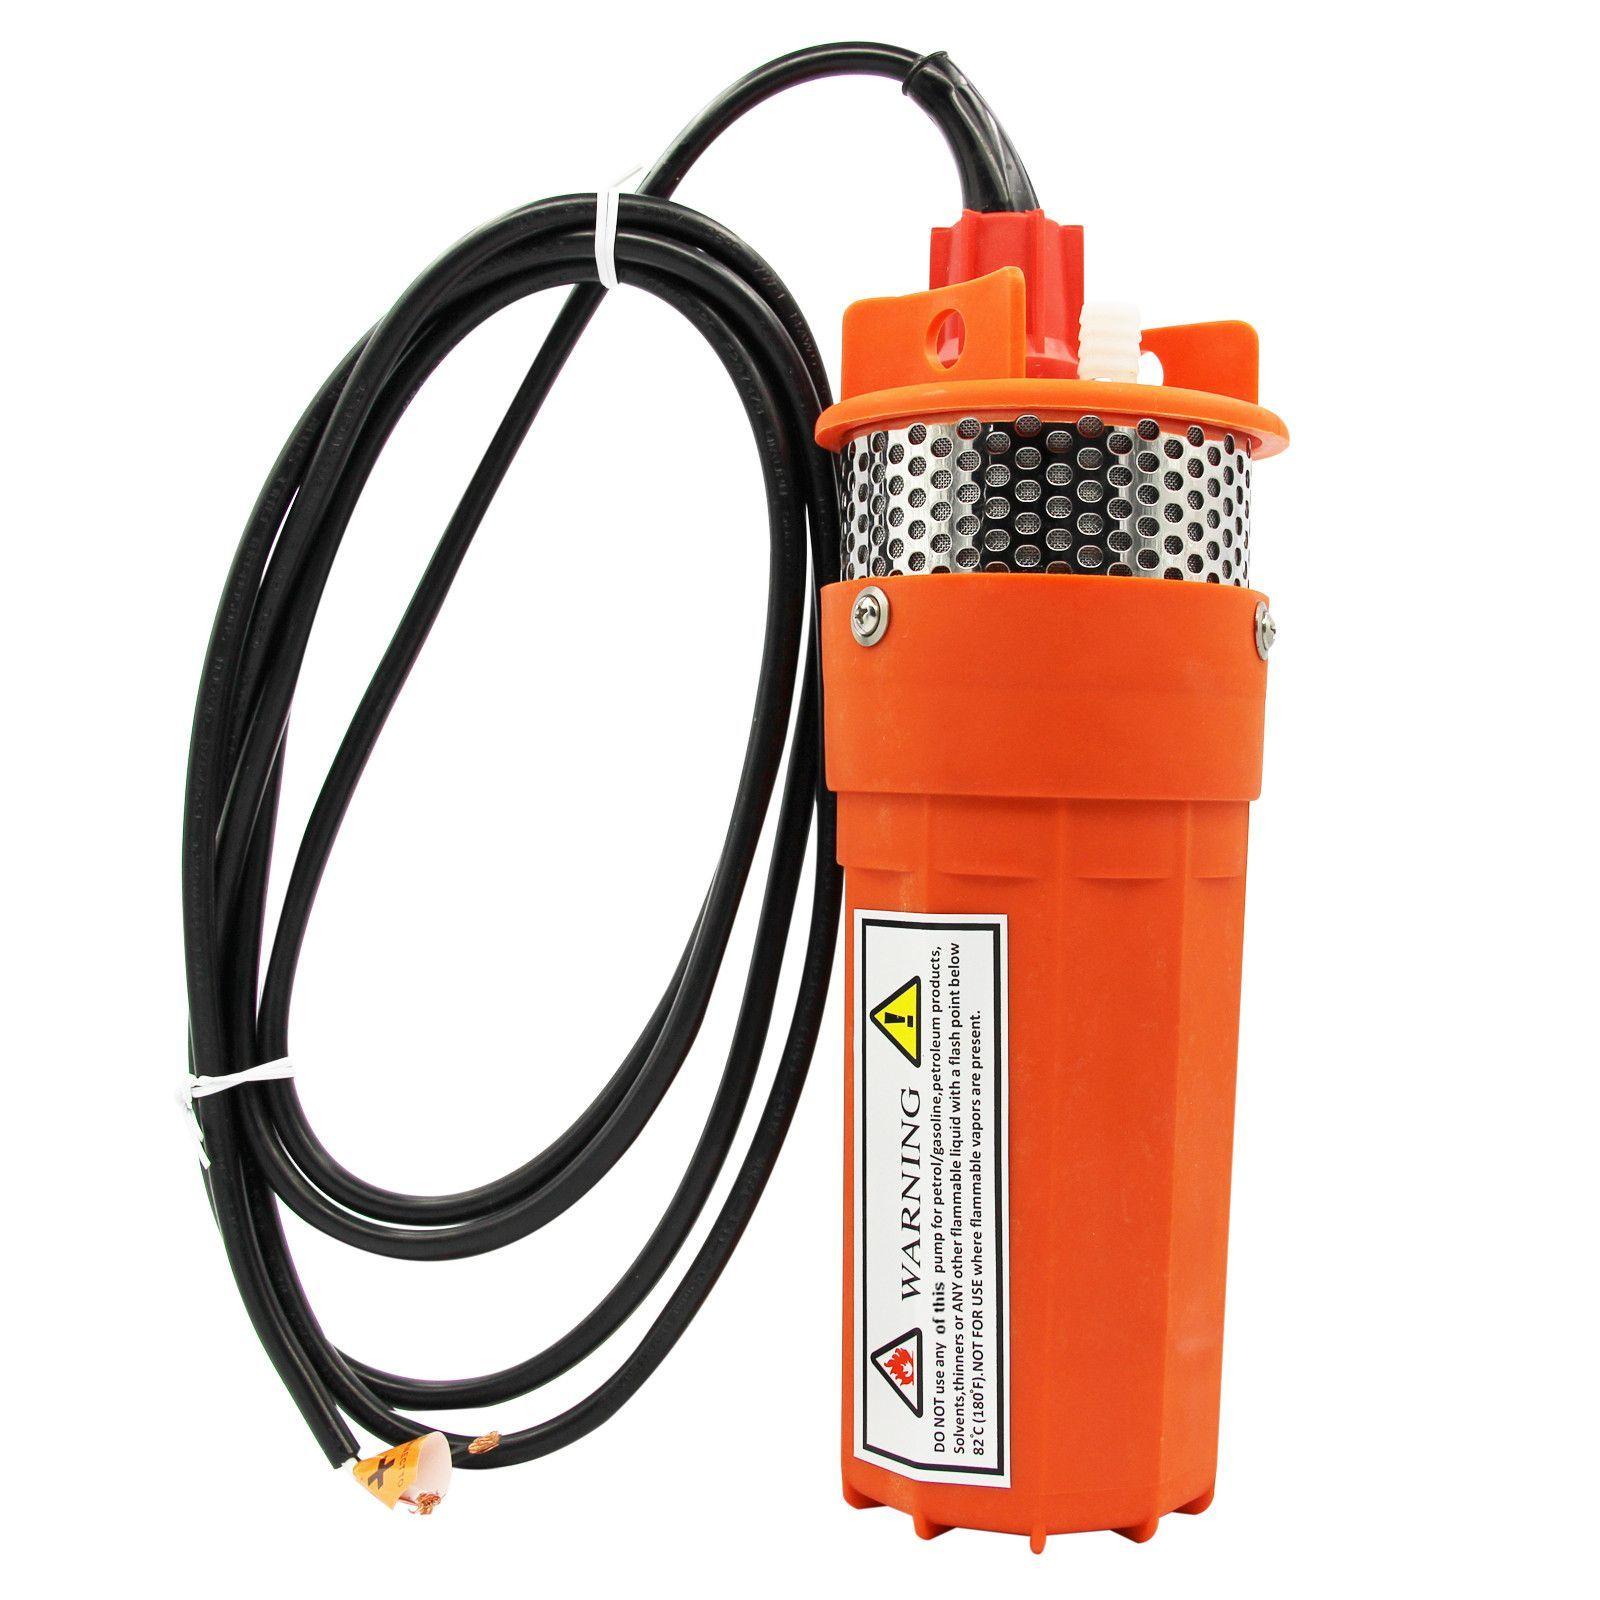 12v 24v Farm Ranch Submersible Deep Well Dc Solar Water Pump Battery Solar Water Pump Submersible Well Pump Well Pump